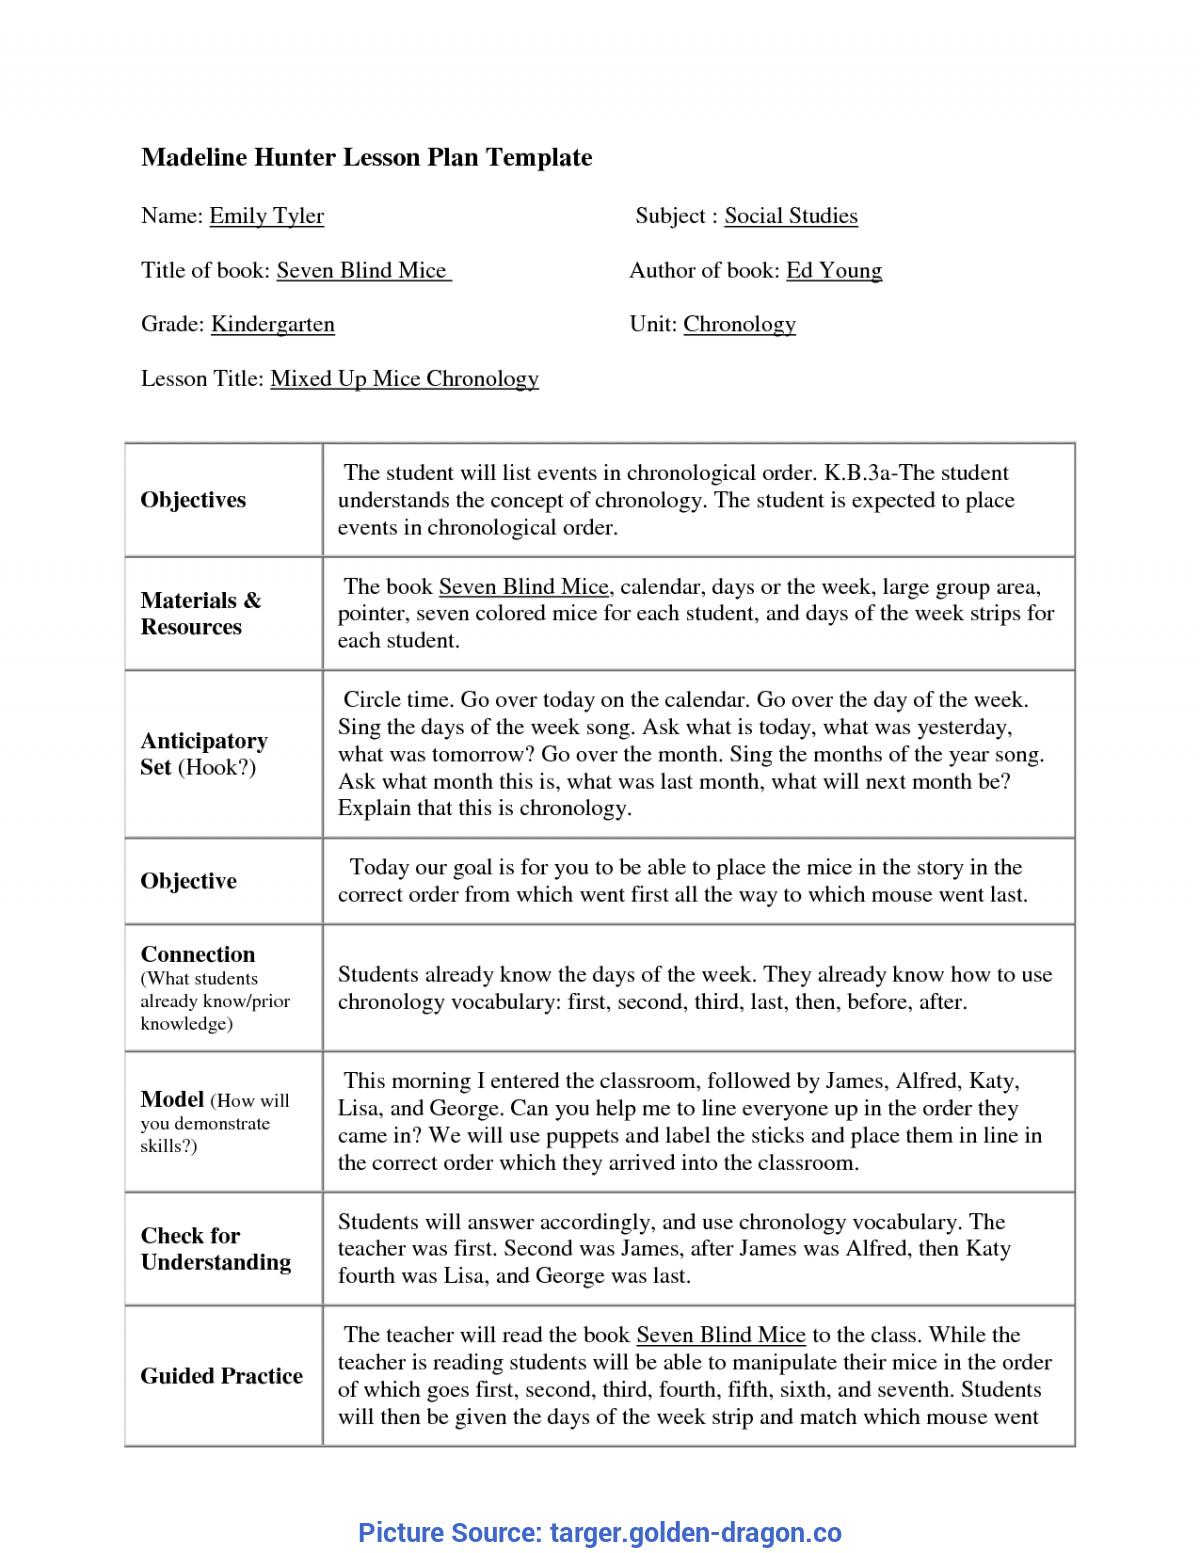 Top Madeline Hunter Lesson Plan Kindergarten Madeline Hunter Regarding Madeline Hunter Lesson Plan Template Blank